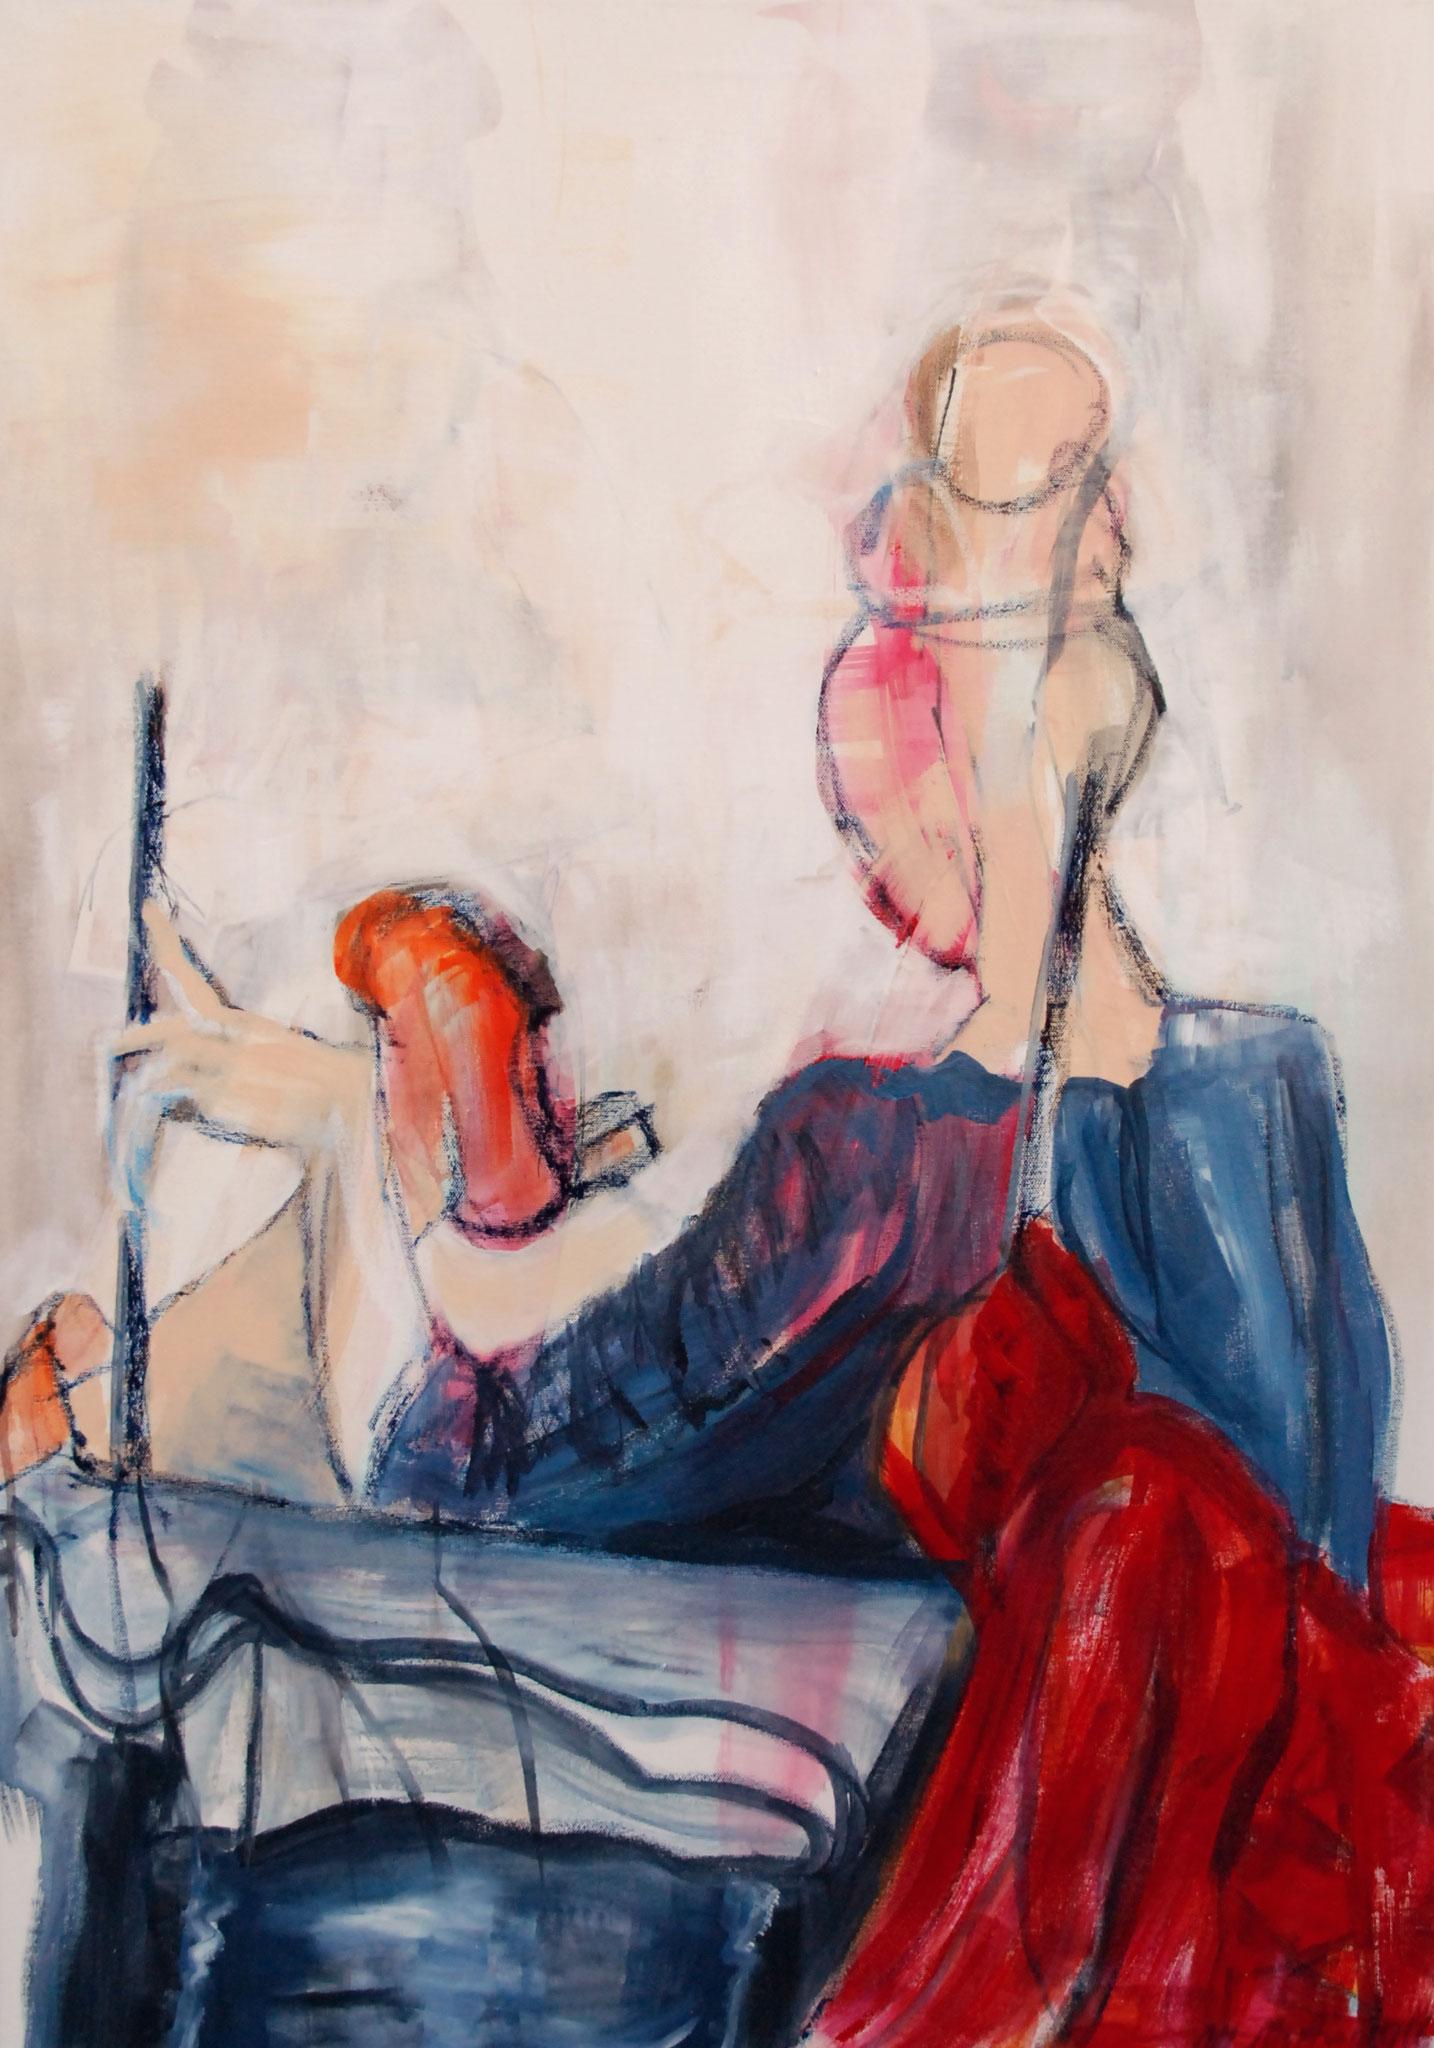 Kristina sitzend, Mixed Media auf Leinwand, 100cm x 70cm